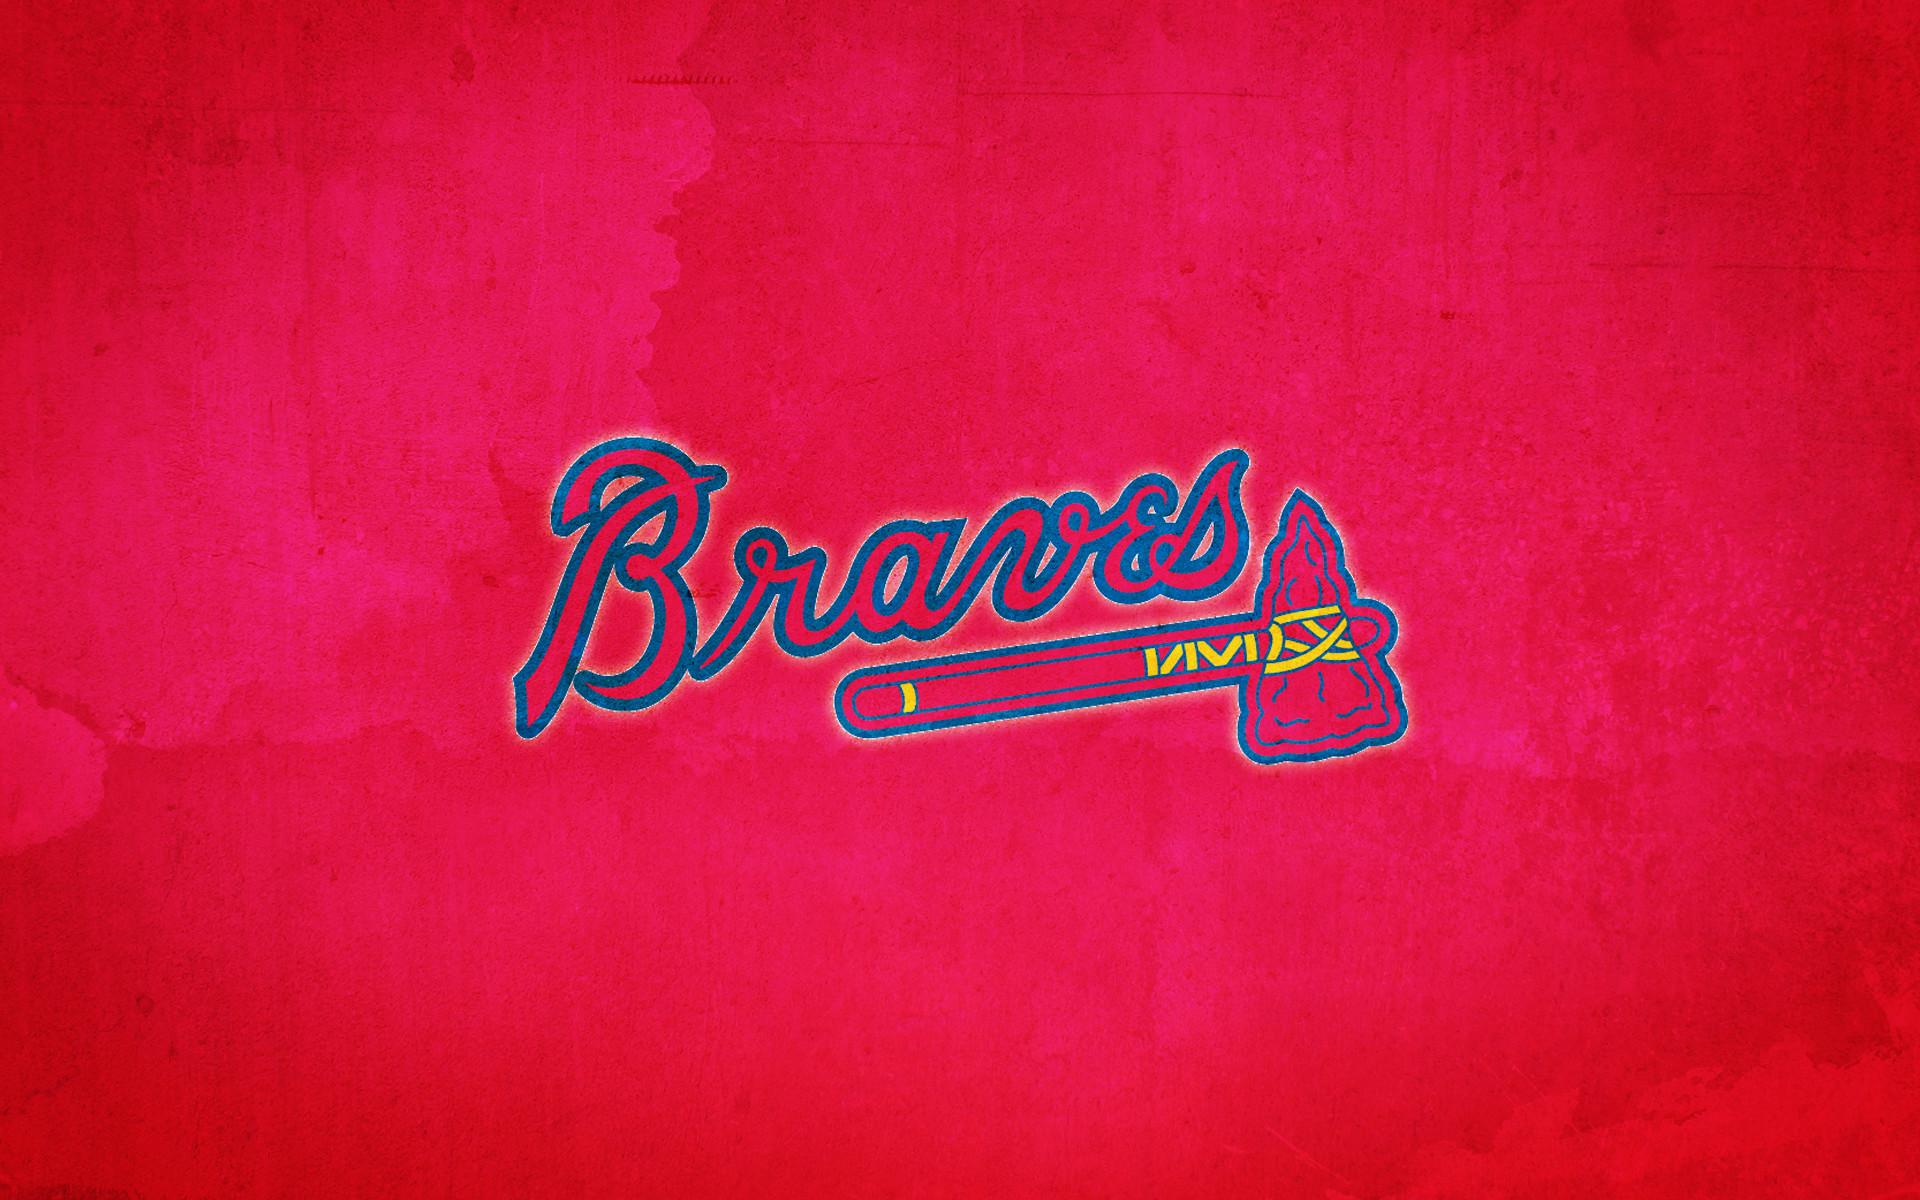 Atlanta Braves Hd Wallpaper 56 Images